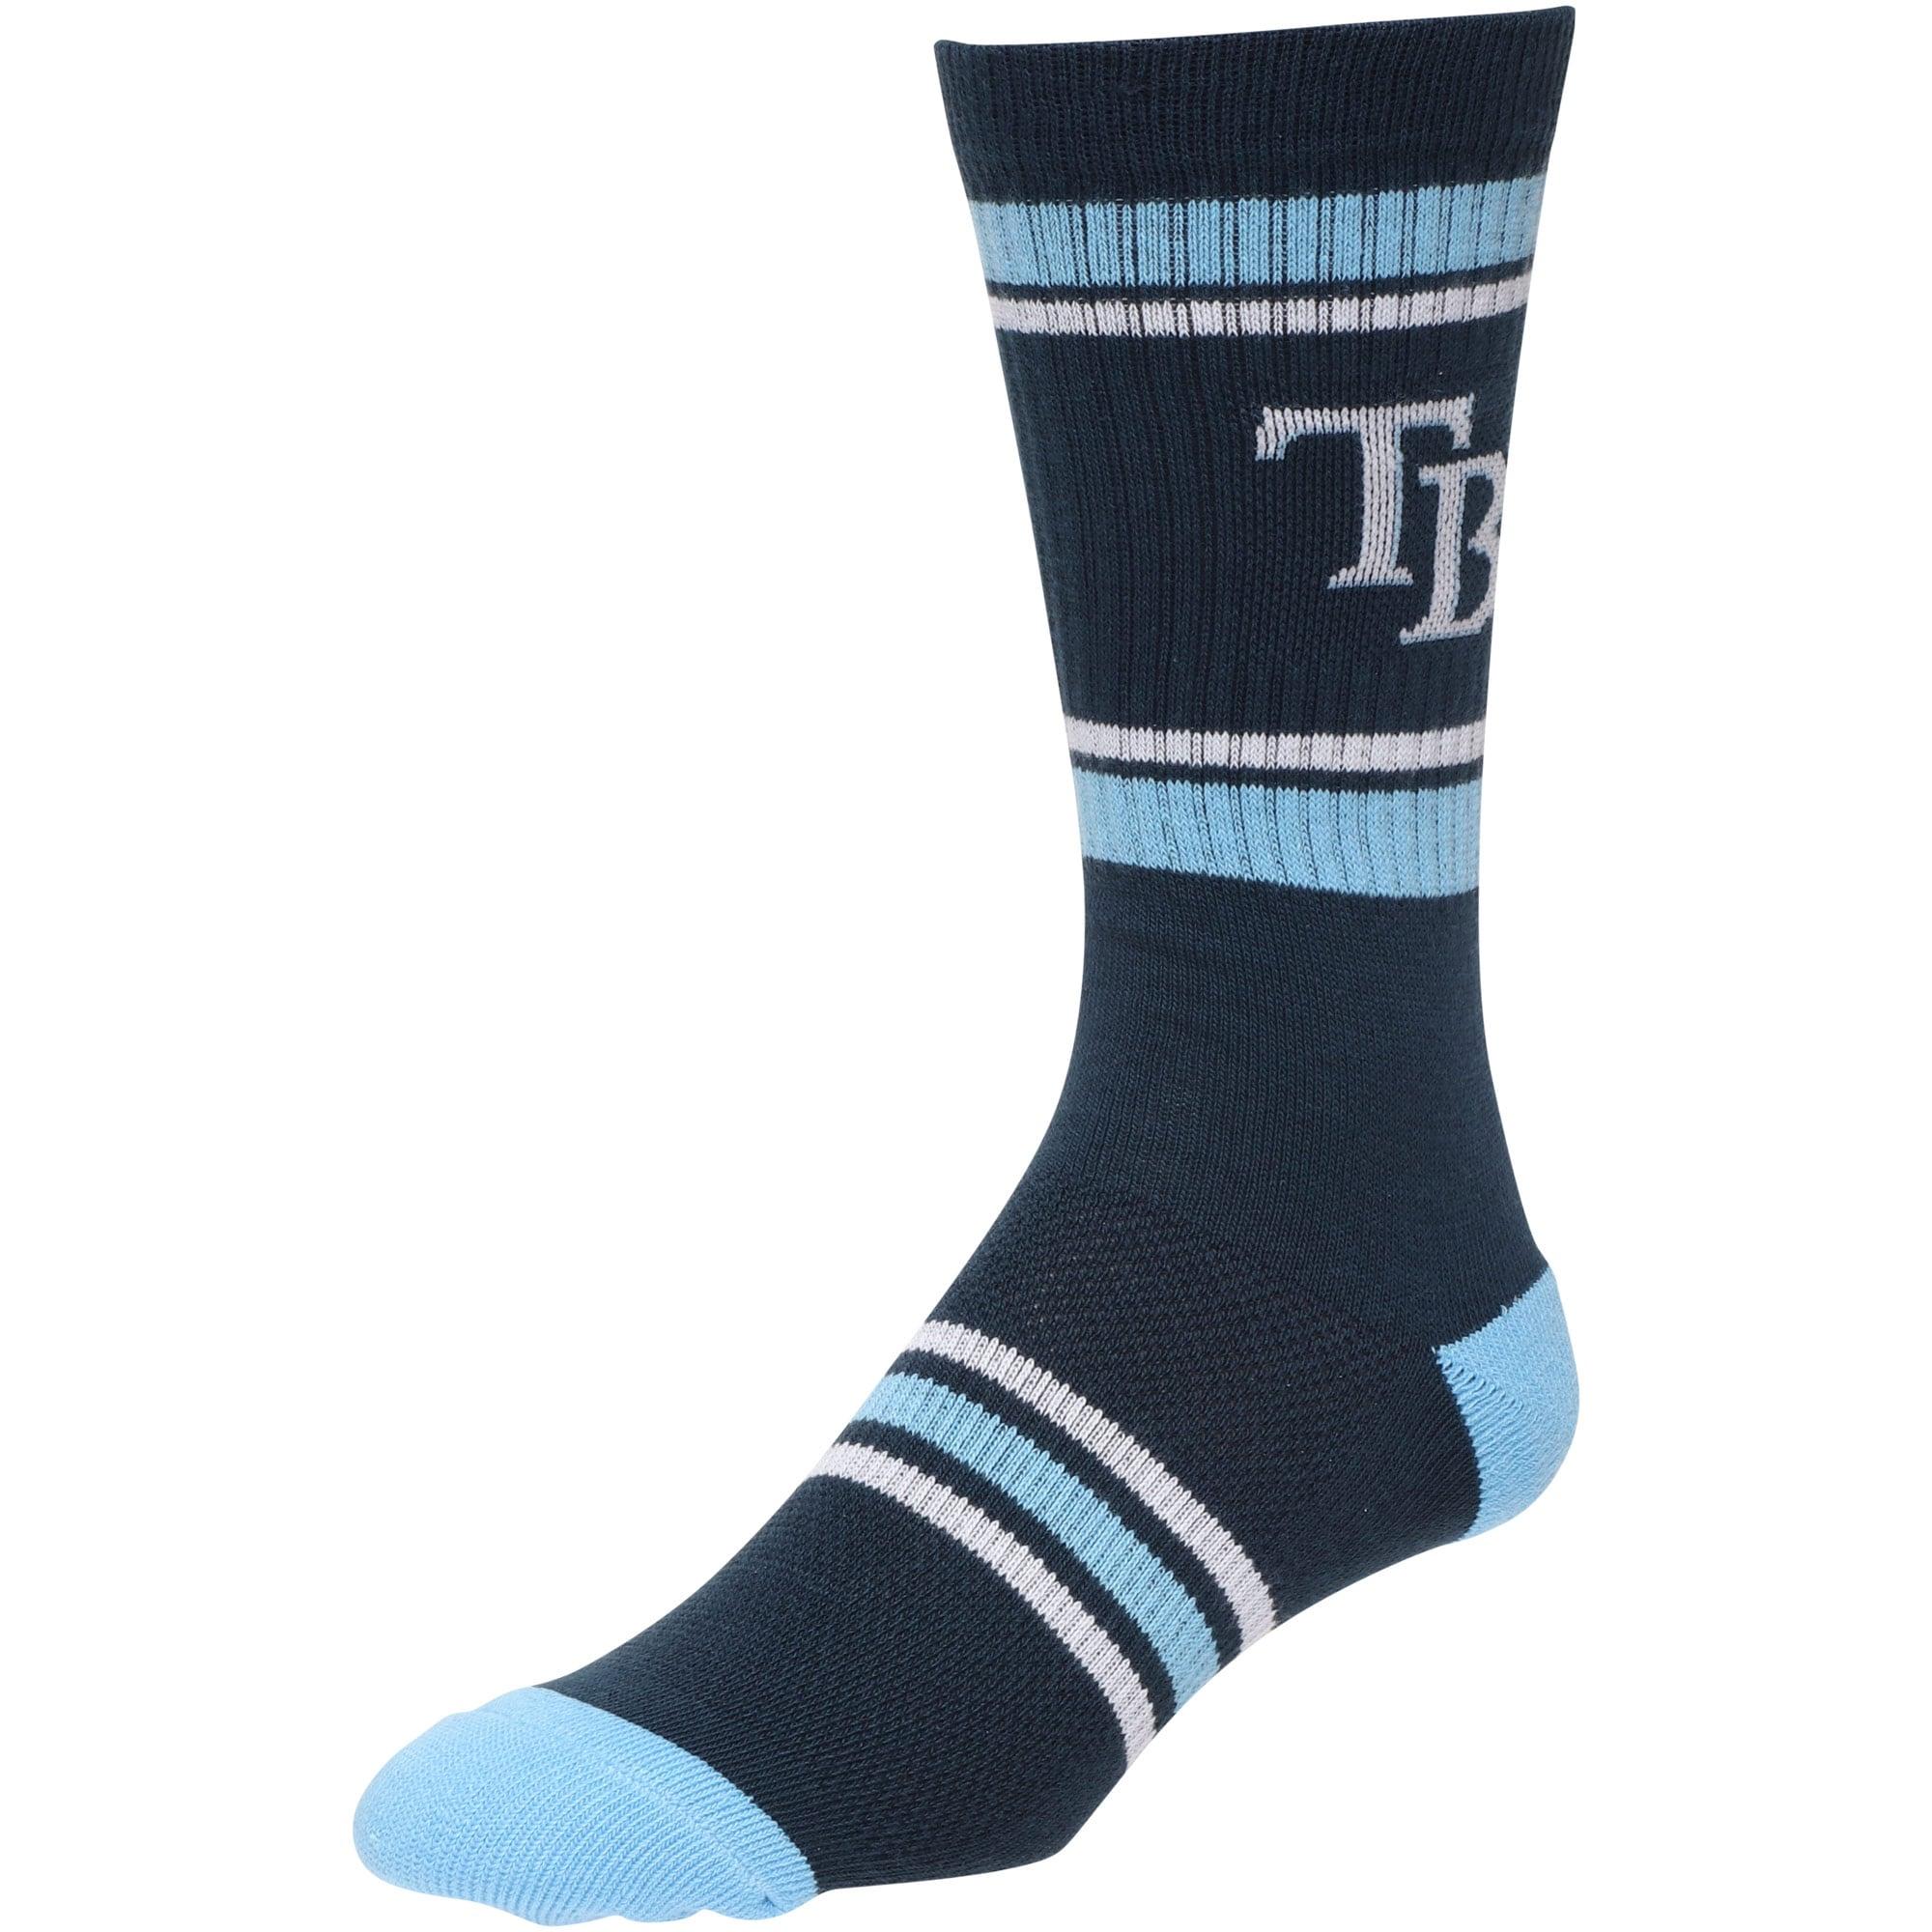 Tampa Bay Rays Stripe Crew Socks - Navy